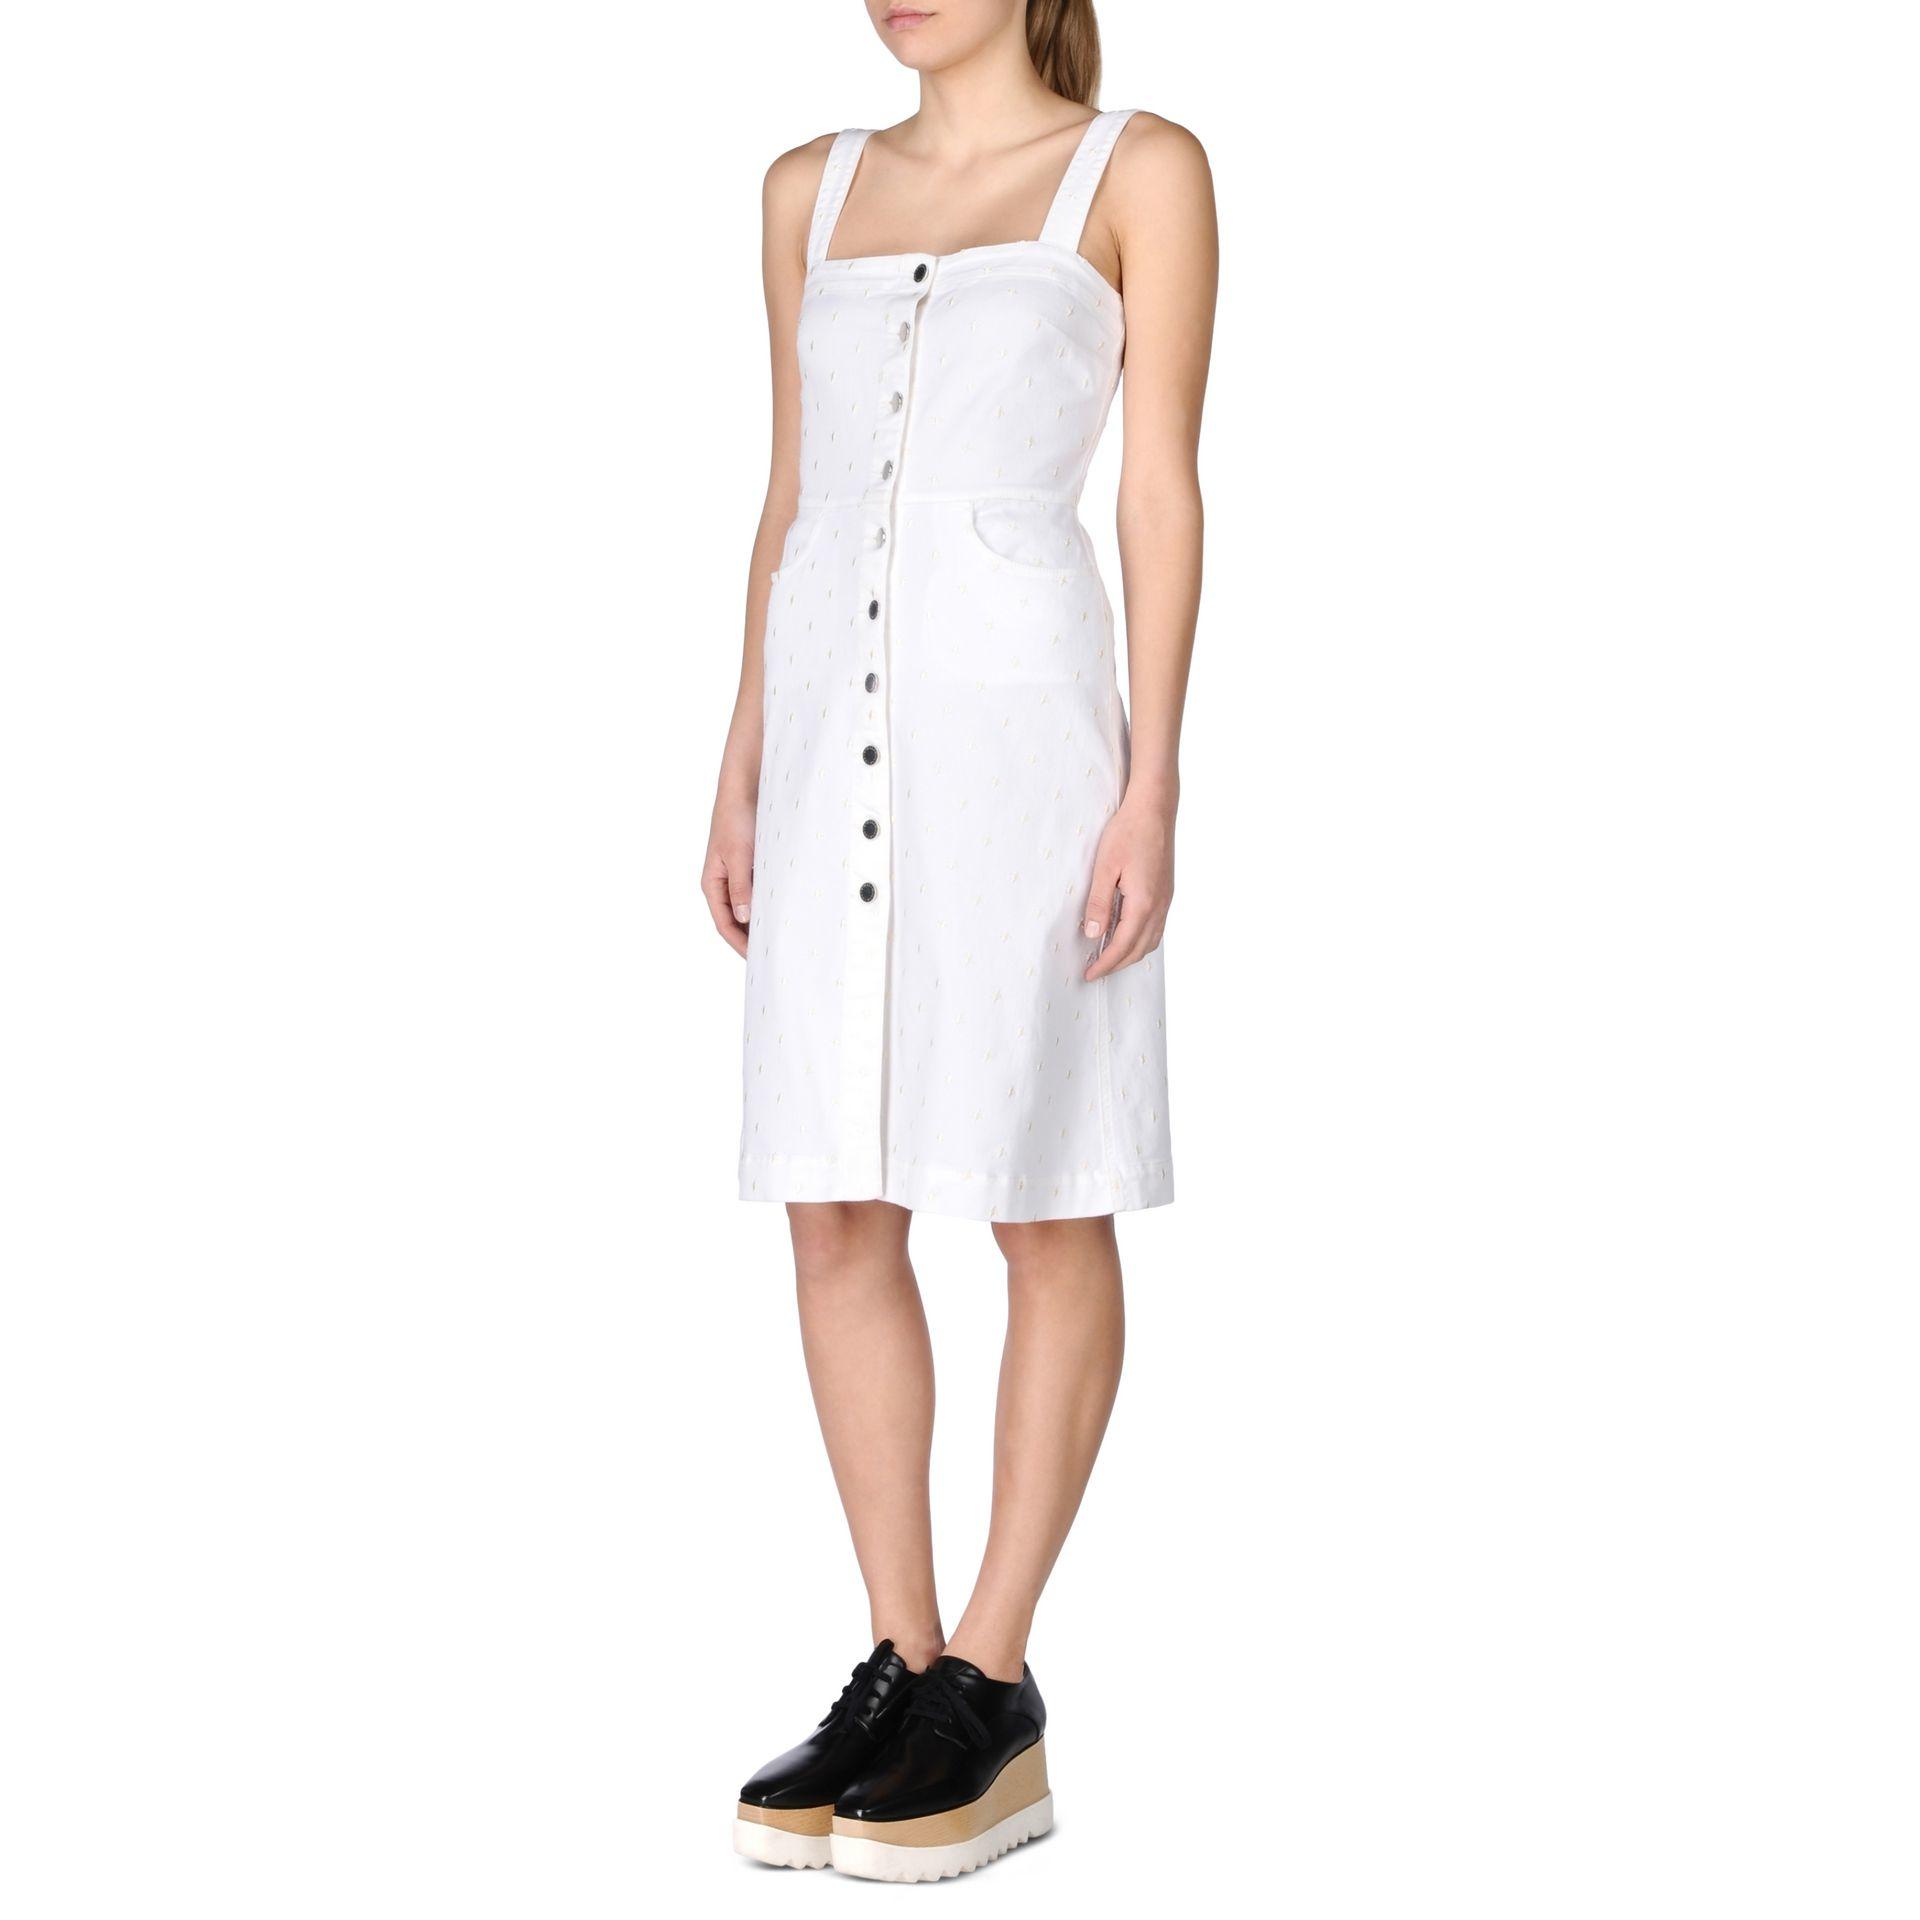 5b9d9eafe8 Lyst - Stella McCartney White Linda Dress in White